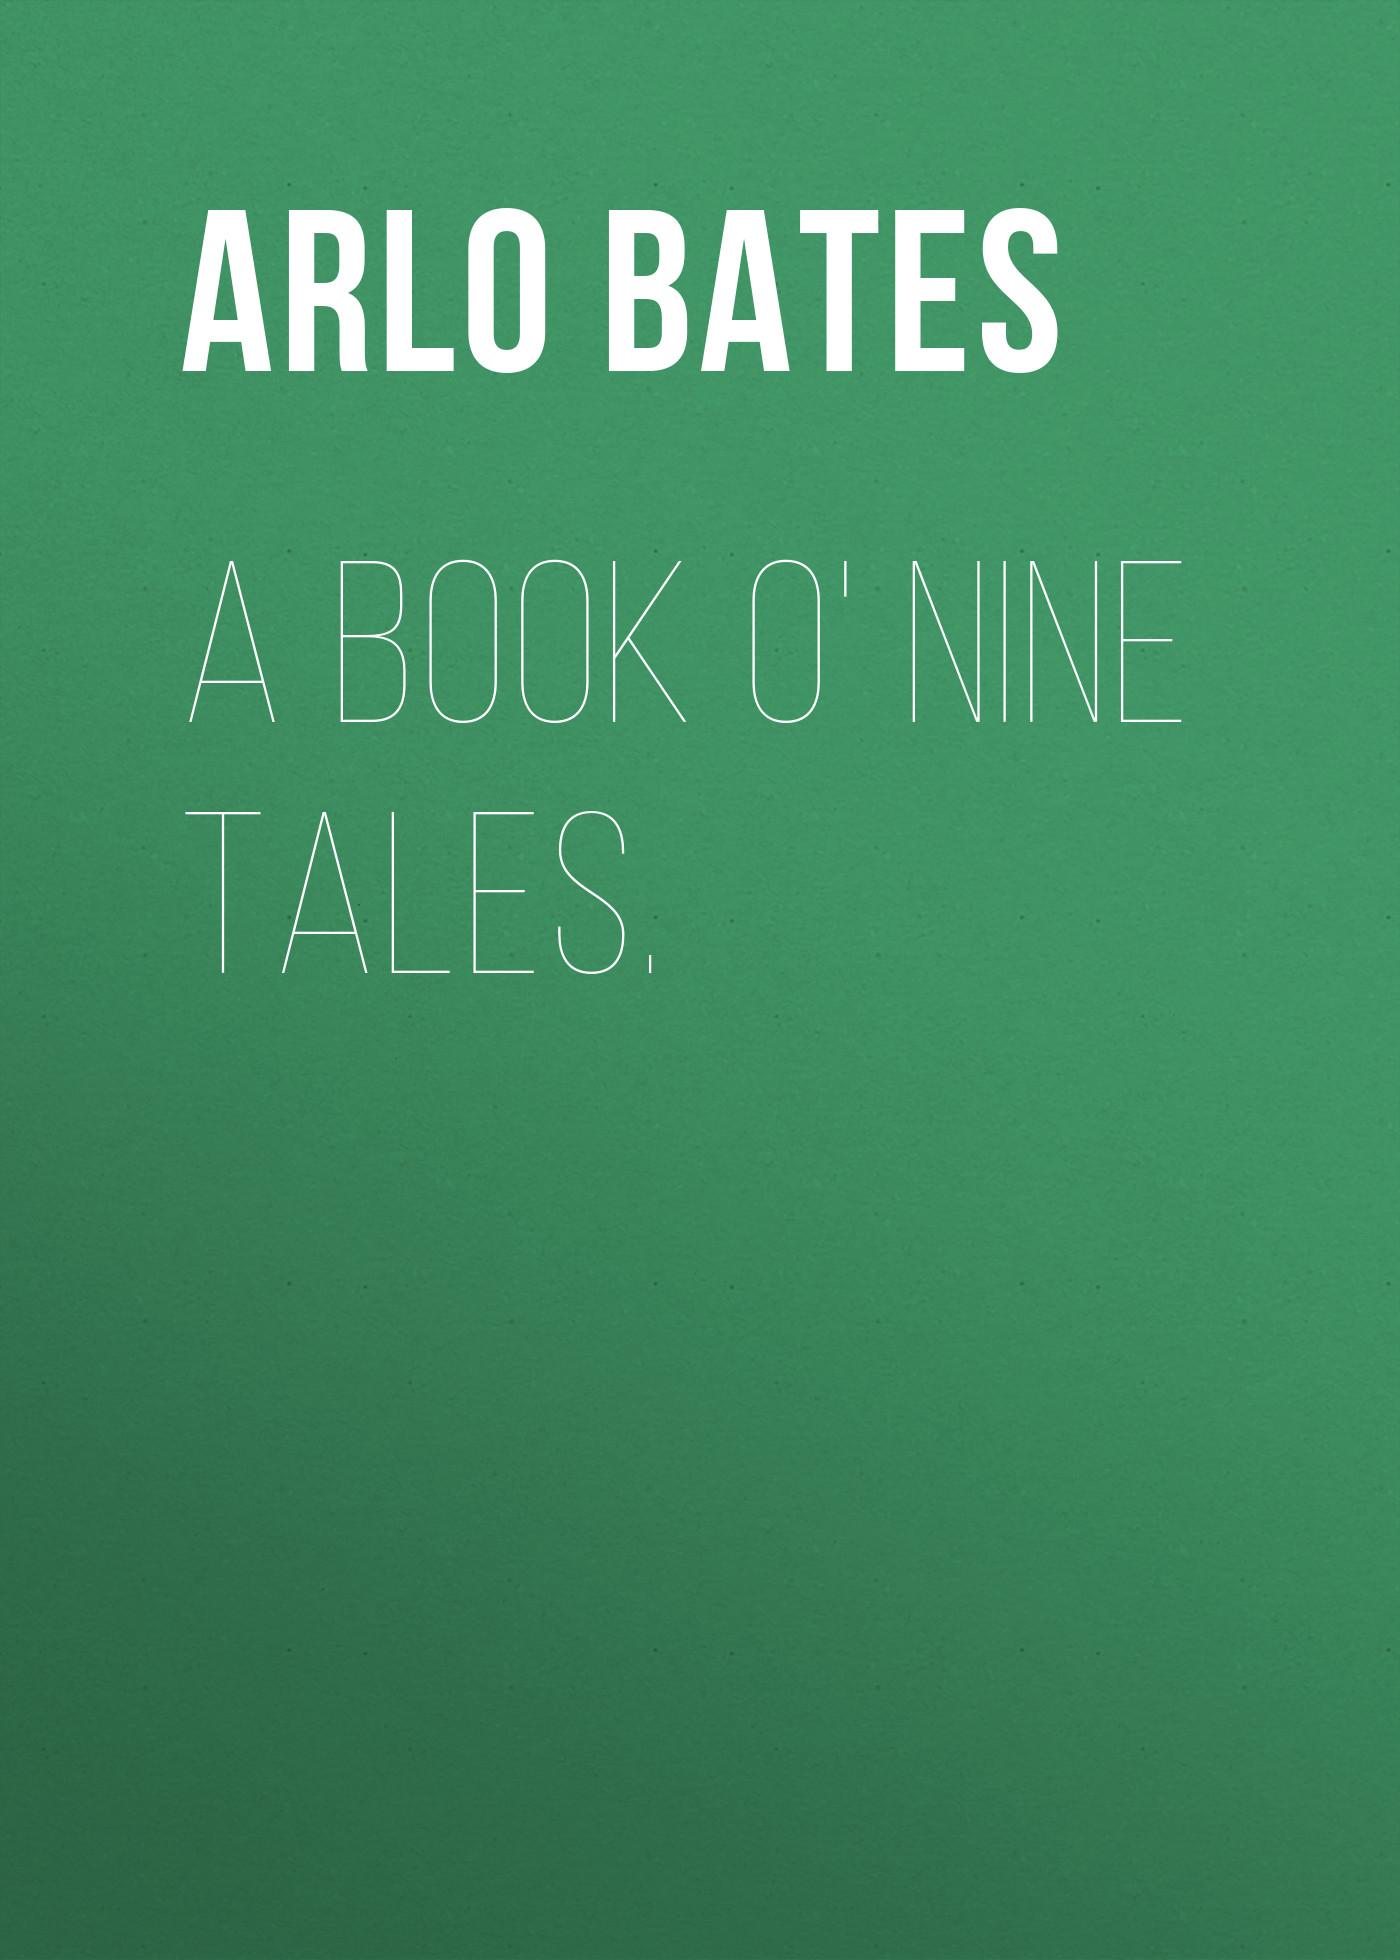 Bates Arlo A Book o Nine Tales.